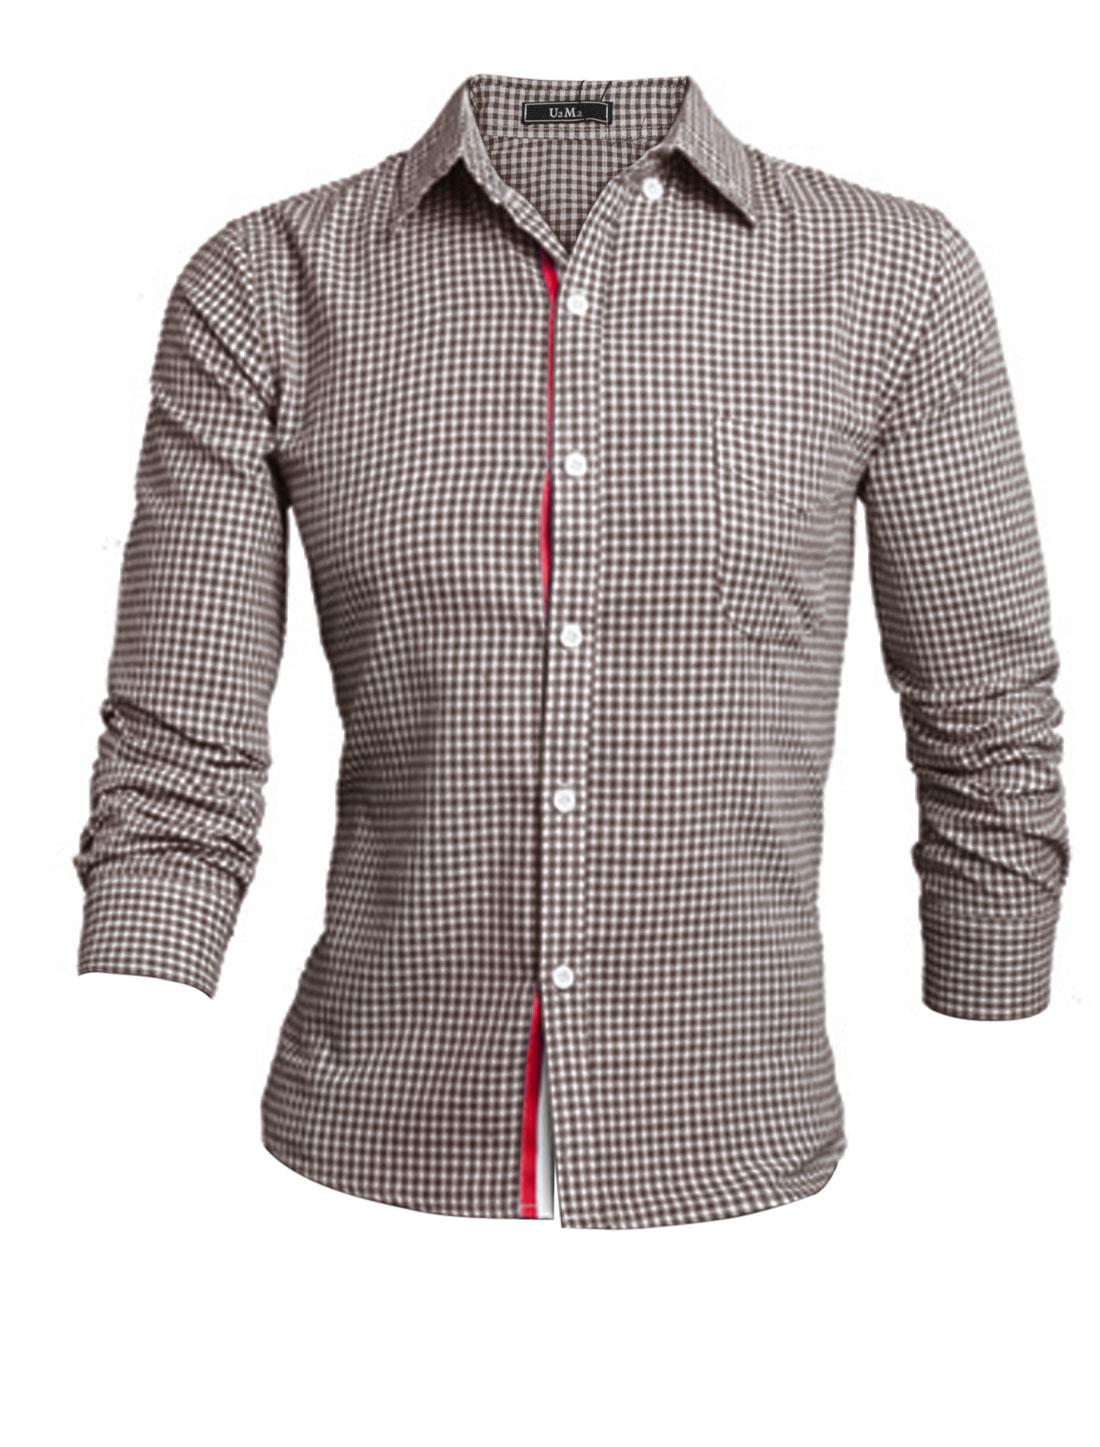 Men Brown White Long Sleeves Point Collar Button Closure Plaids Leisure Shirt M